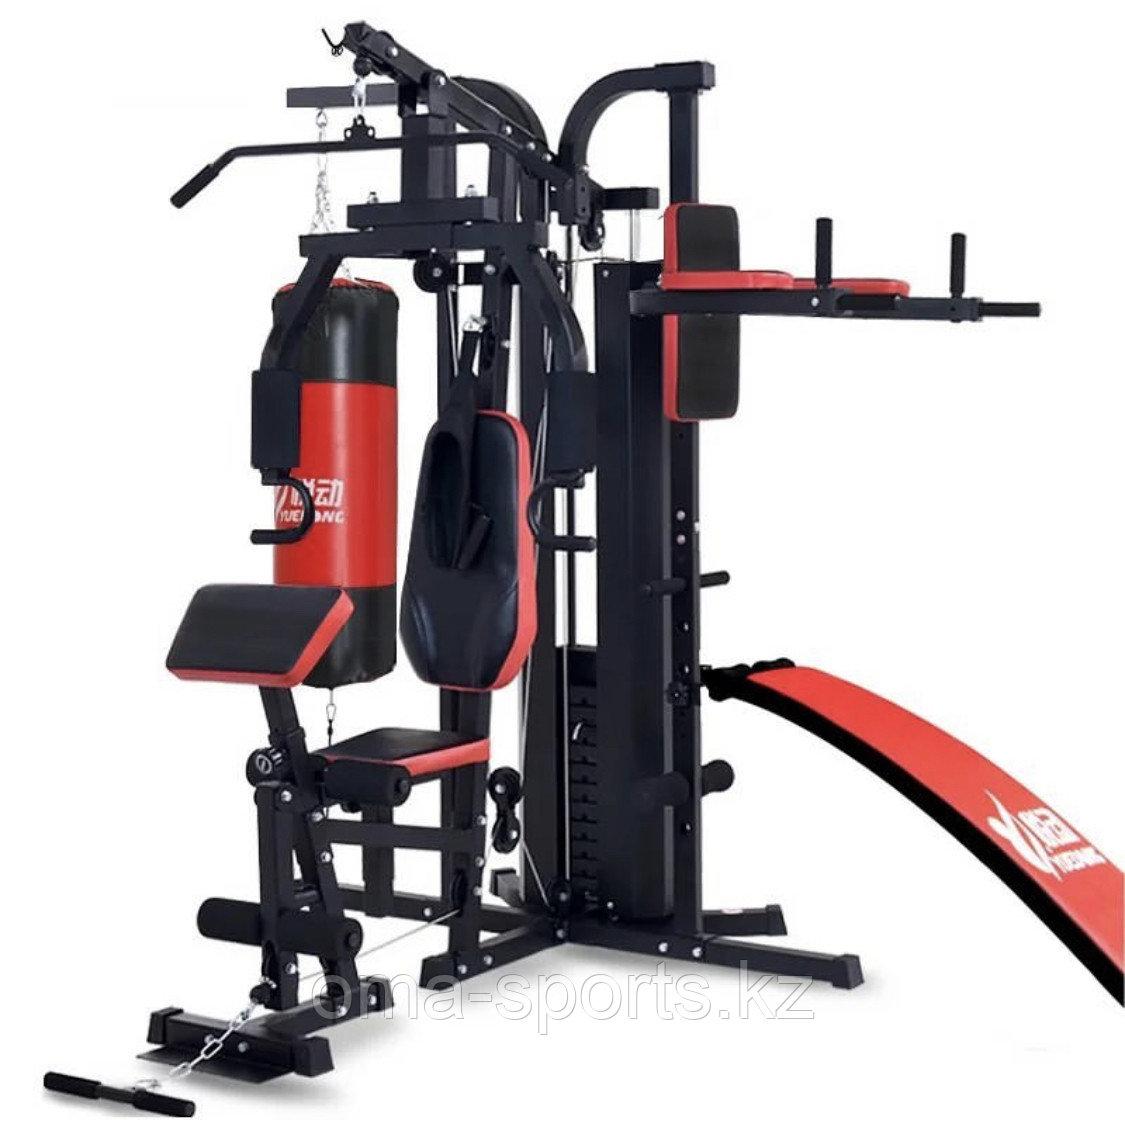 Тренажер 3-Station Gym F-8015 из 5 частей